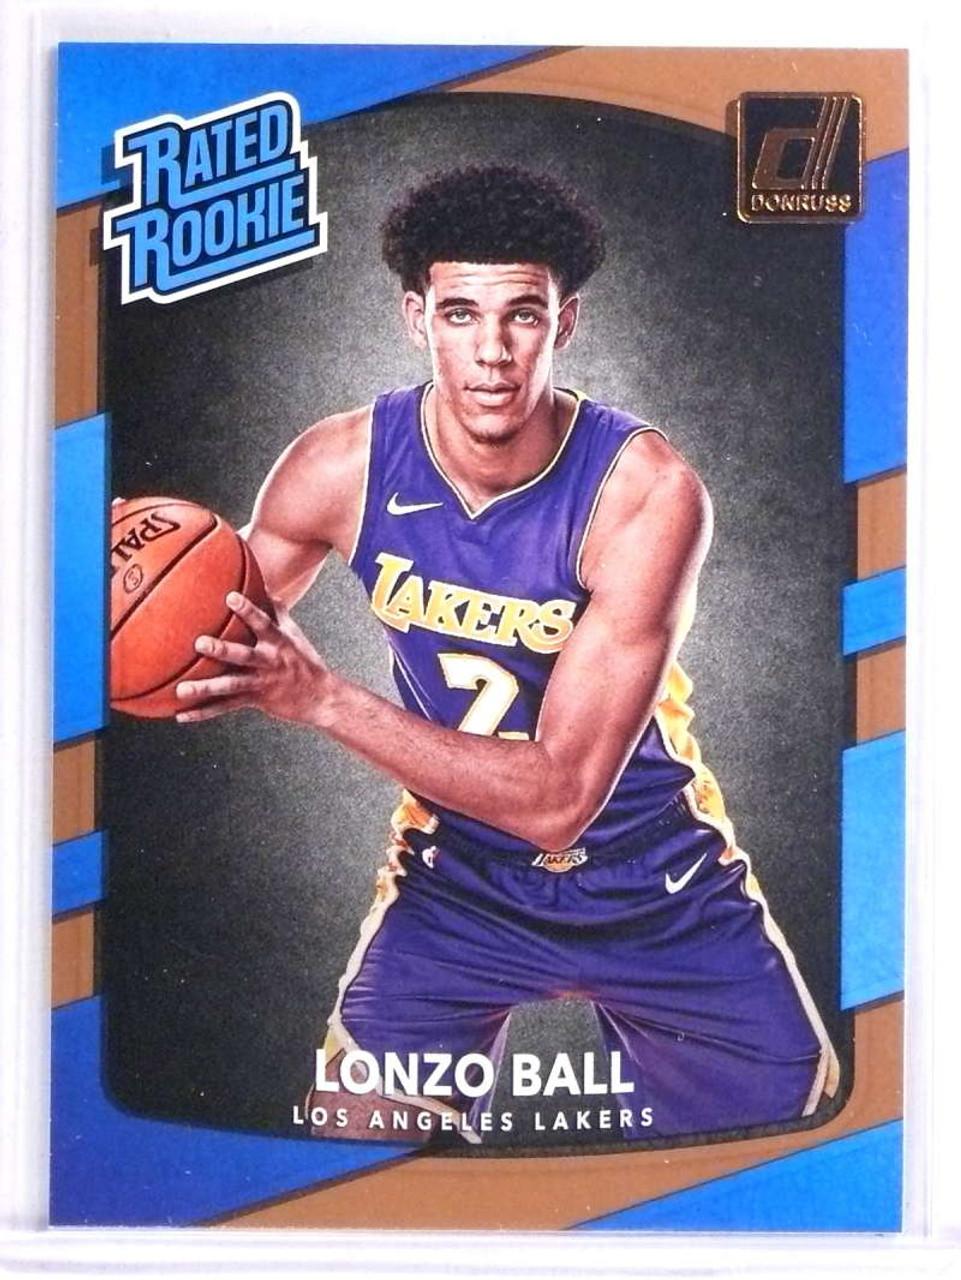 767cec4a5 2017-18 Panini Donruss Lonzo Ball Rookie RC  199  71473 - Sportsnut ...